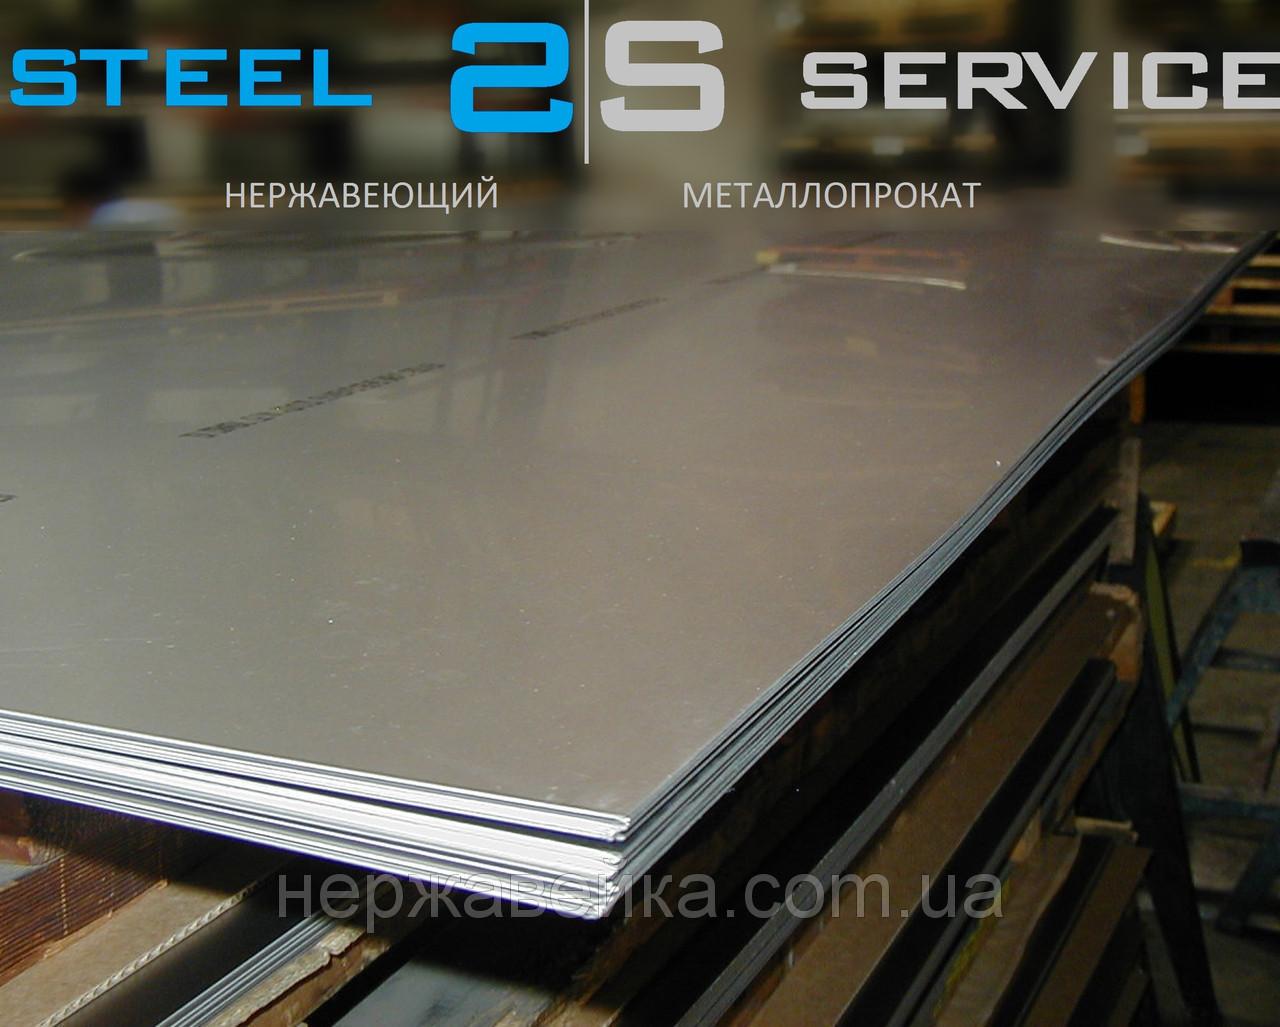 Лист нержавійка 12х1500х6000мм AISI 410S(08Х13) F1 - гарячекатаний, технічний